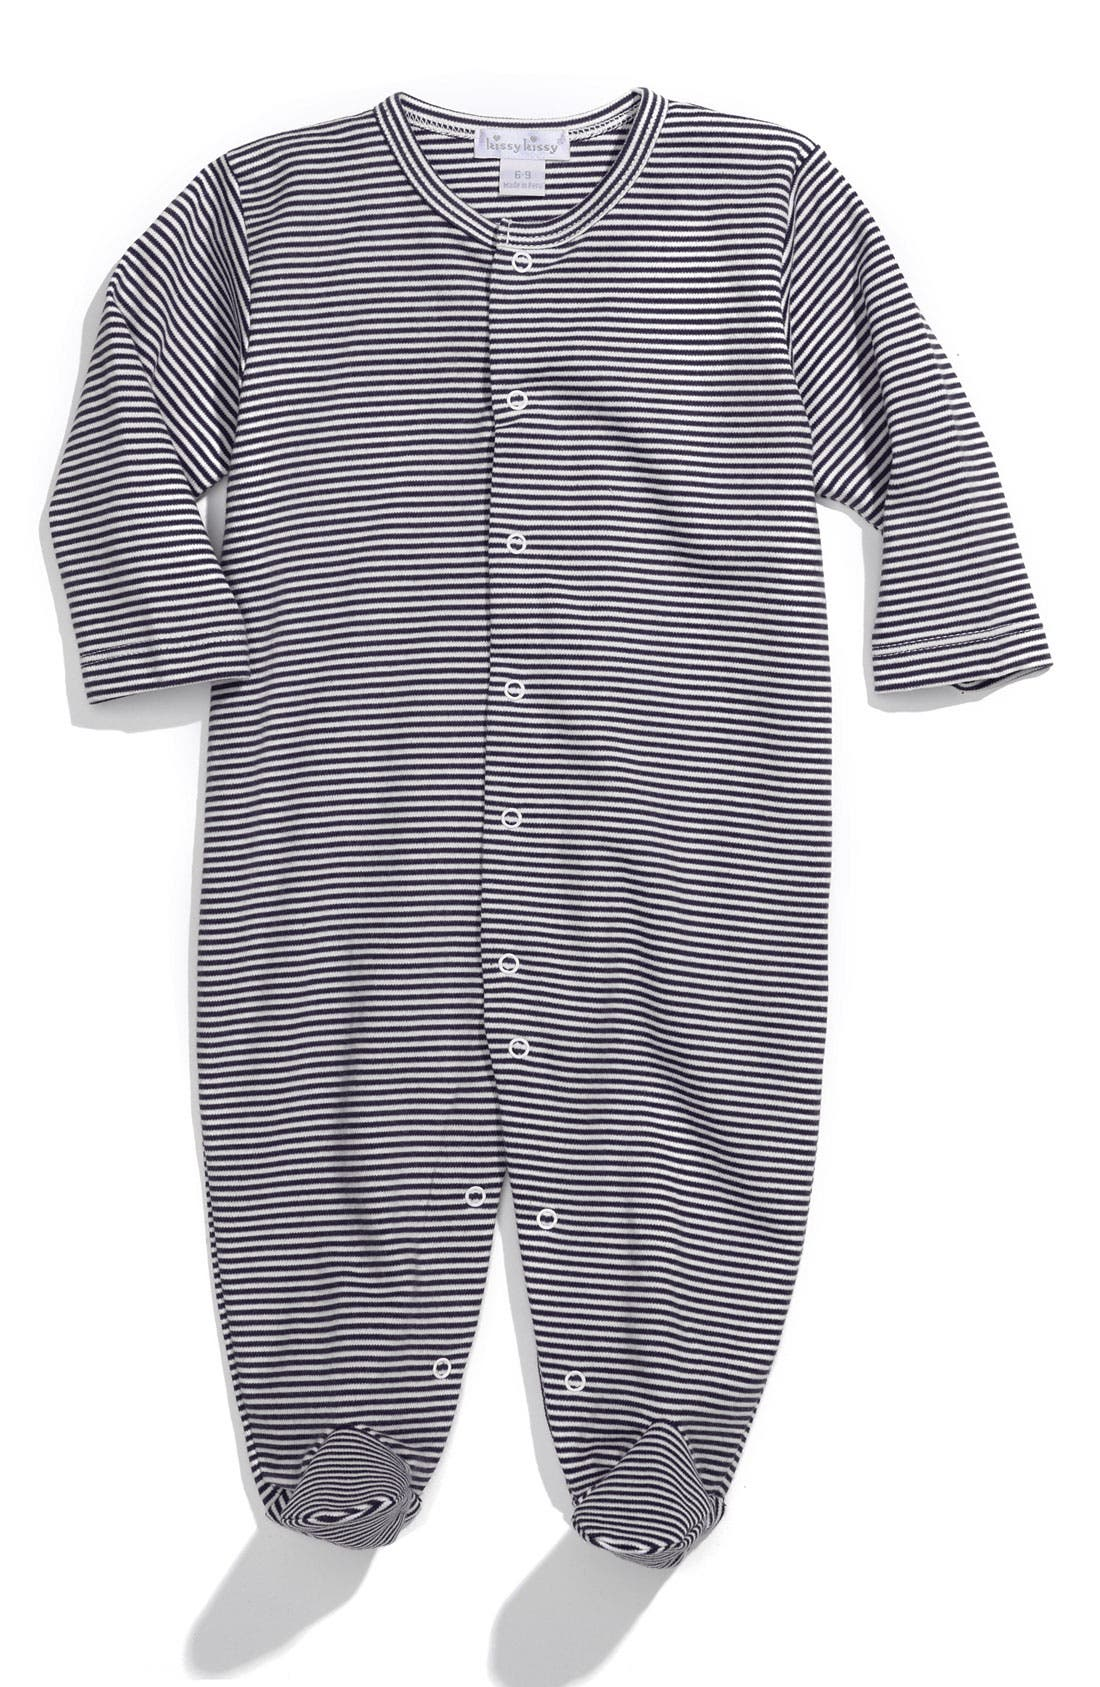 Alternate Image 1 Selected - Kissy Kissy Stripe Footie (Infant)